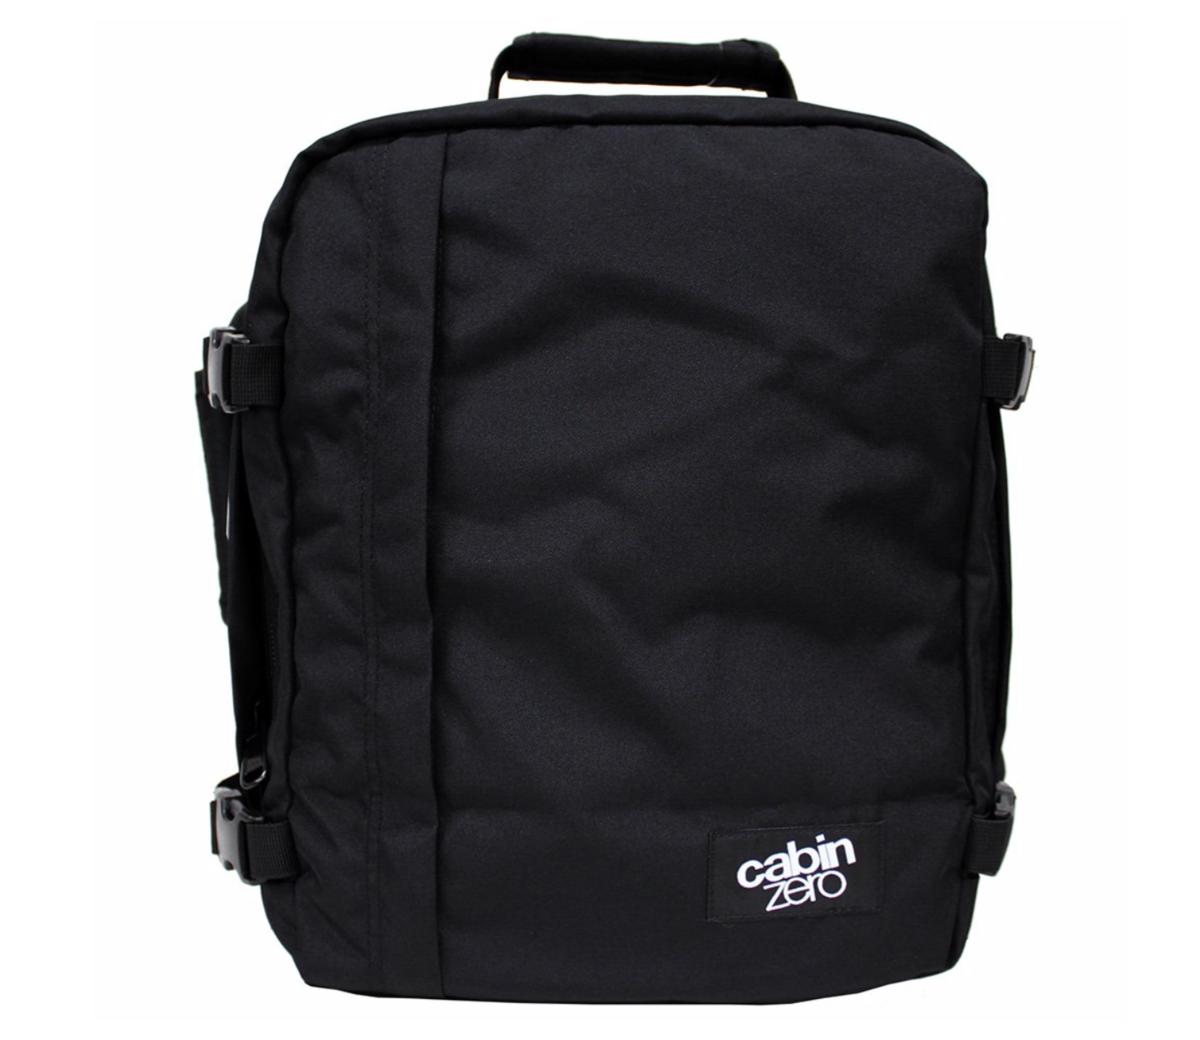 f:id:thebackpack:20190602082418p:plain